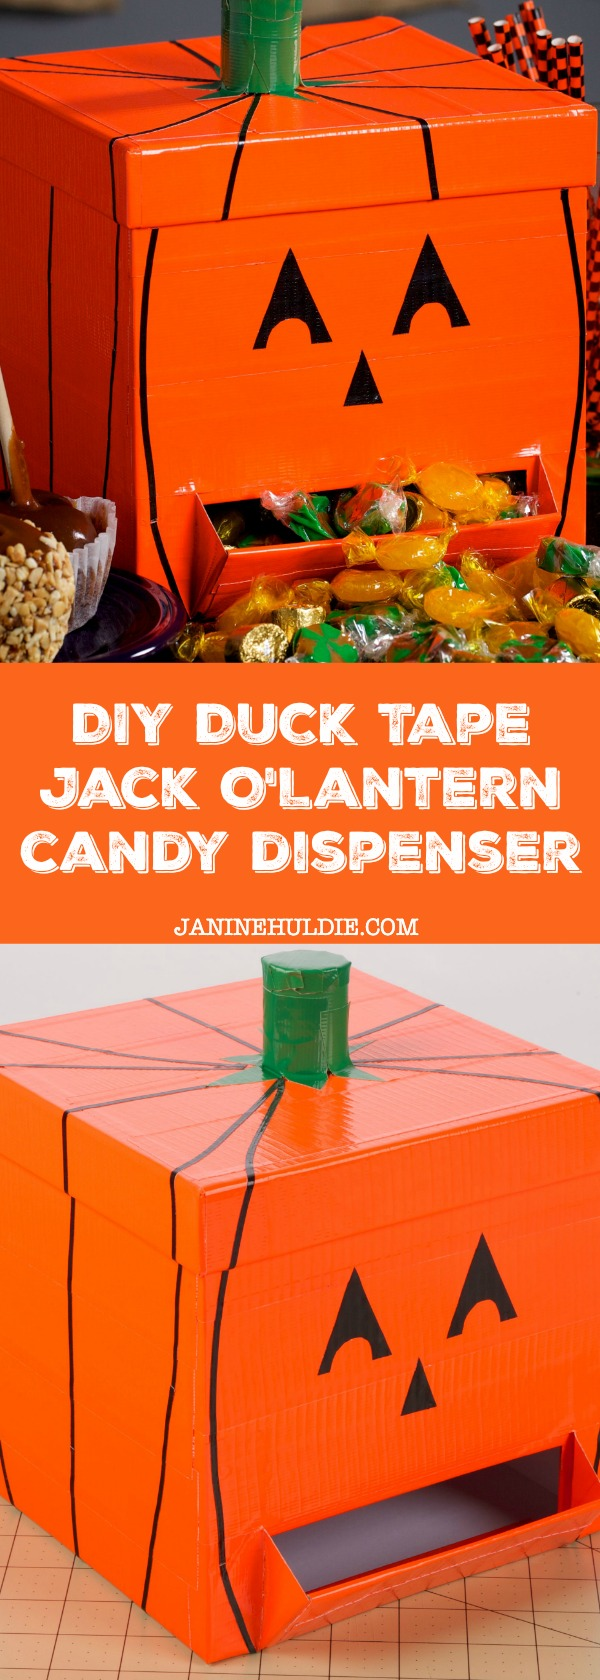 DIY Duck Tape Jack O Lantern Candy Dispenser